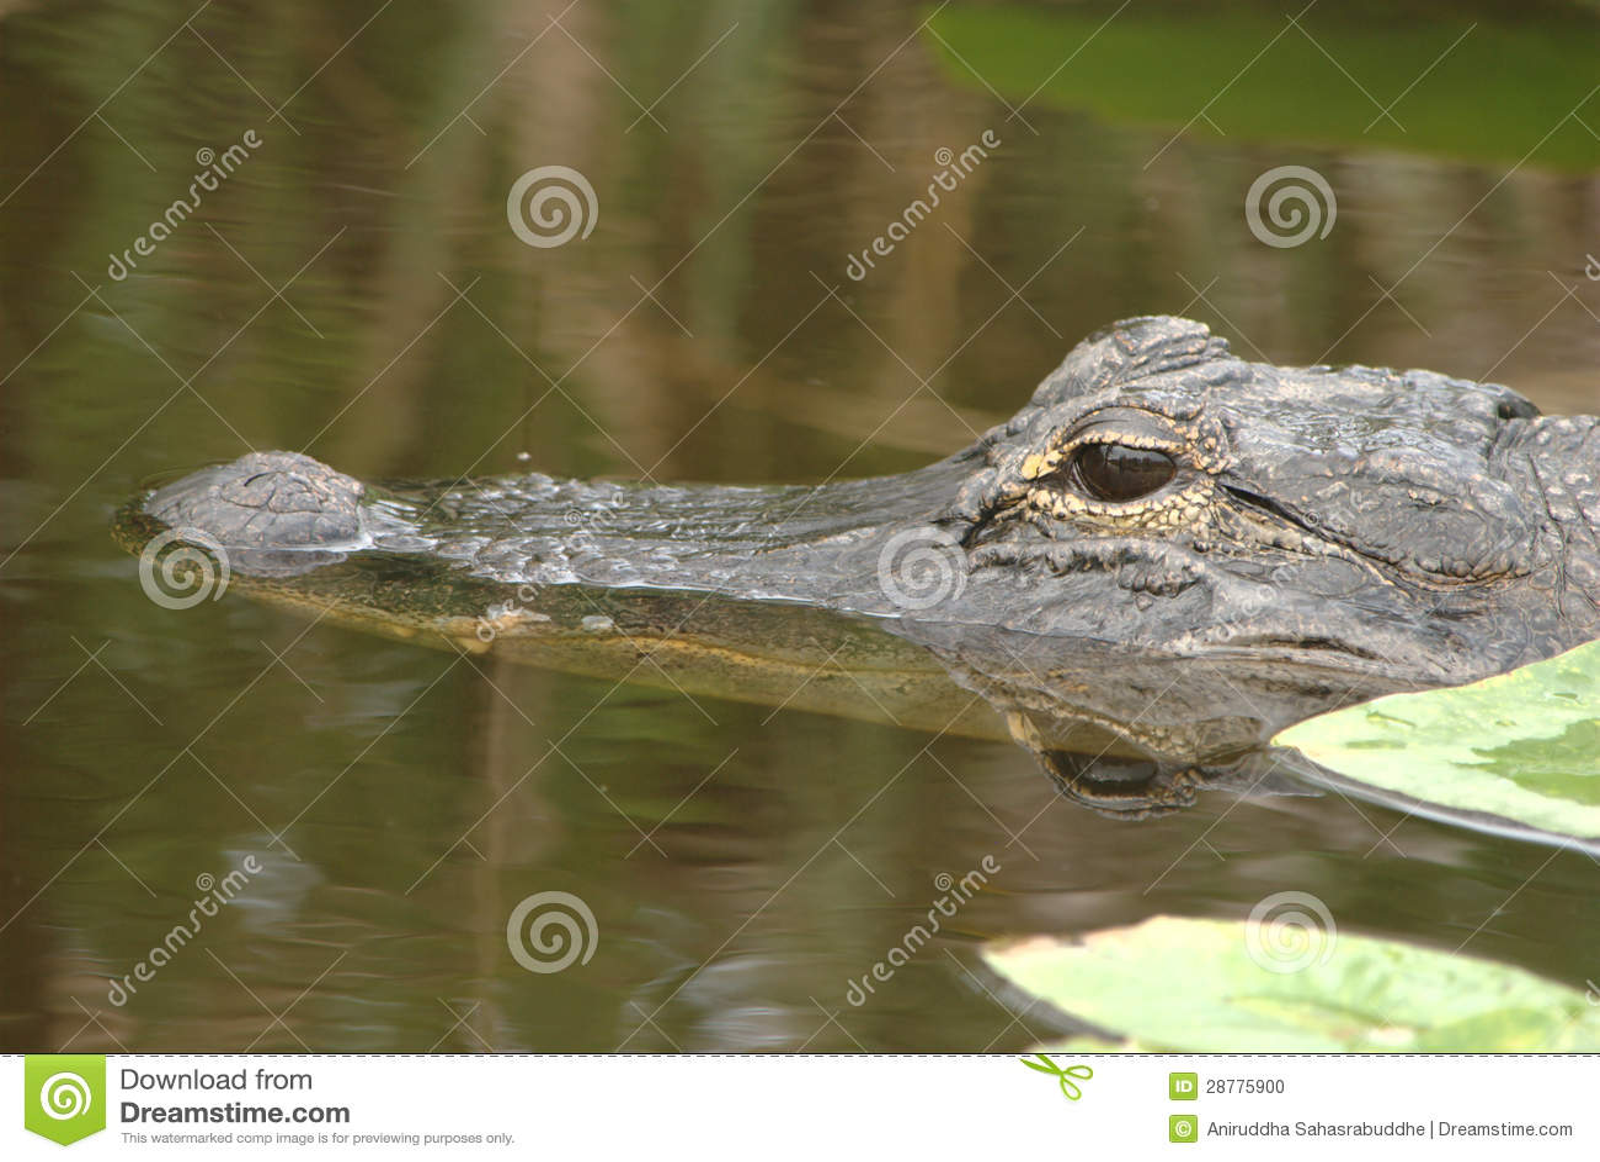 Аллигатор в одичалом